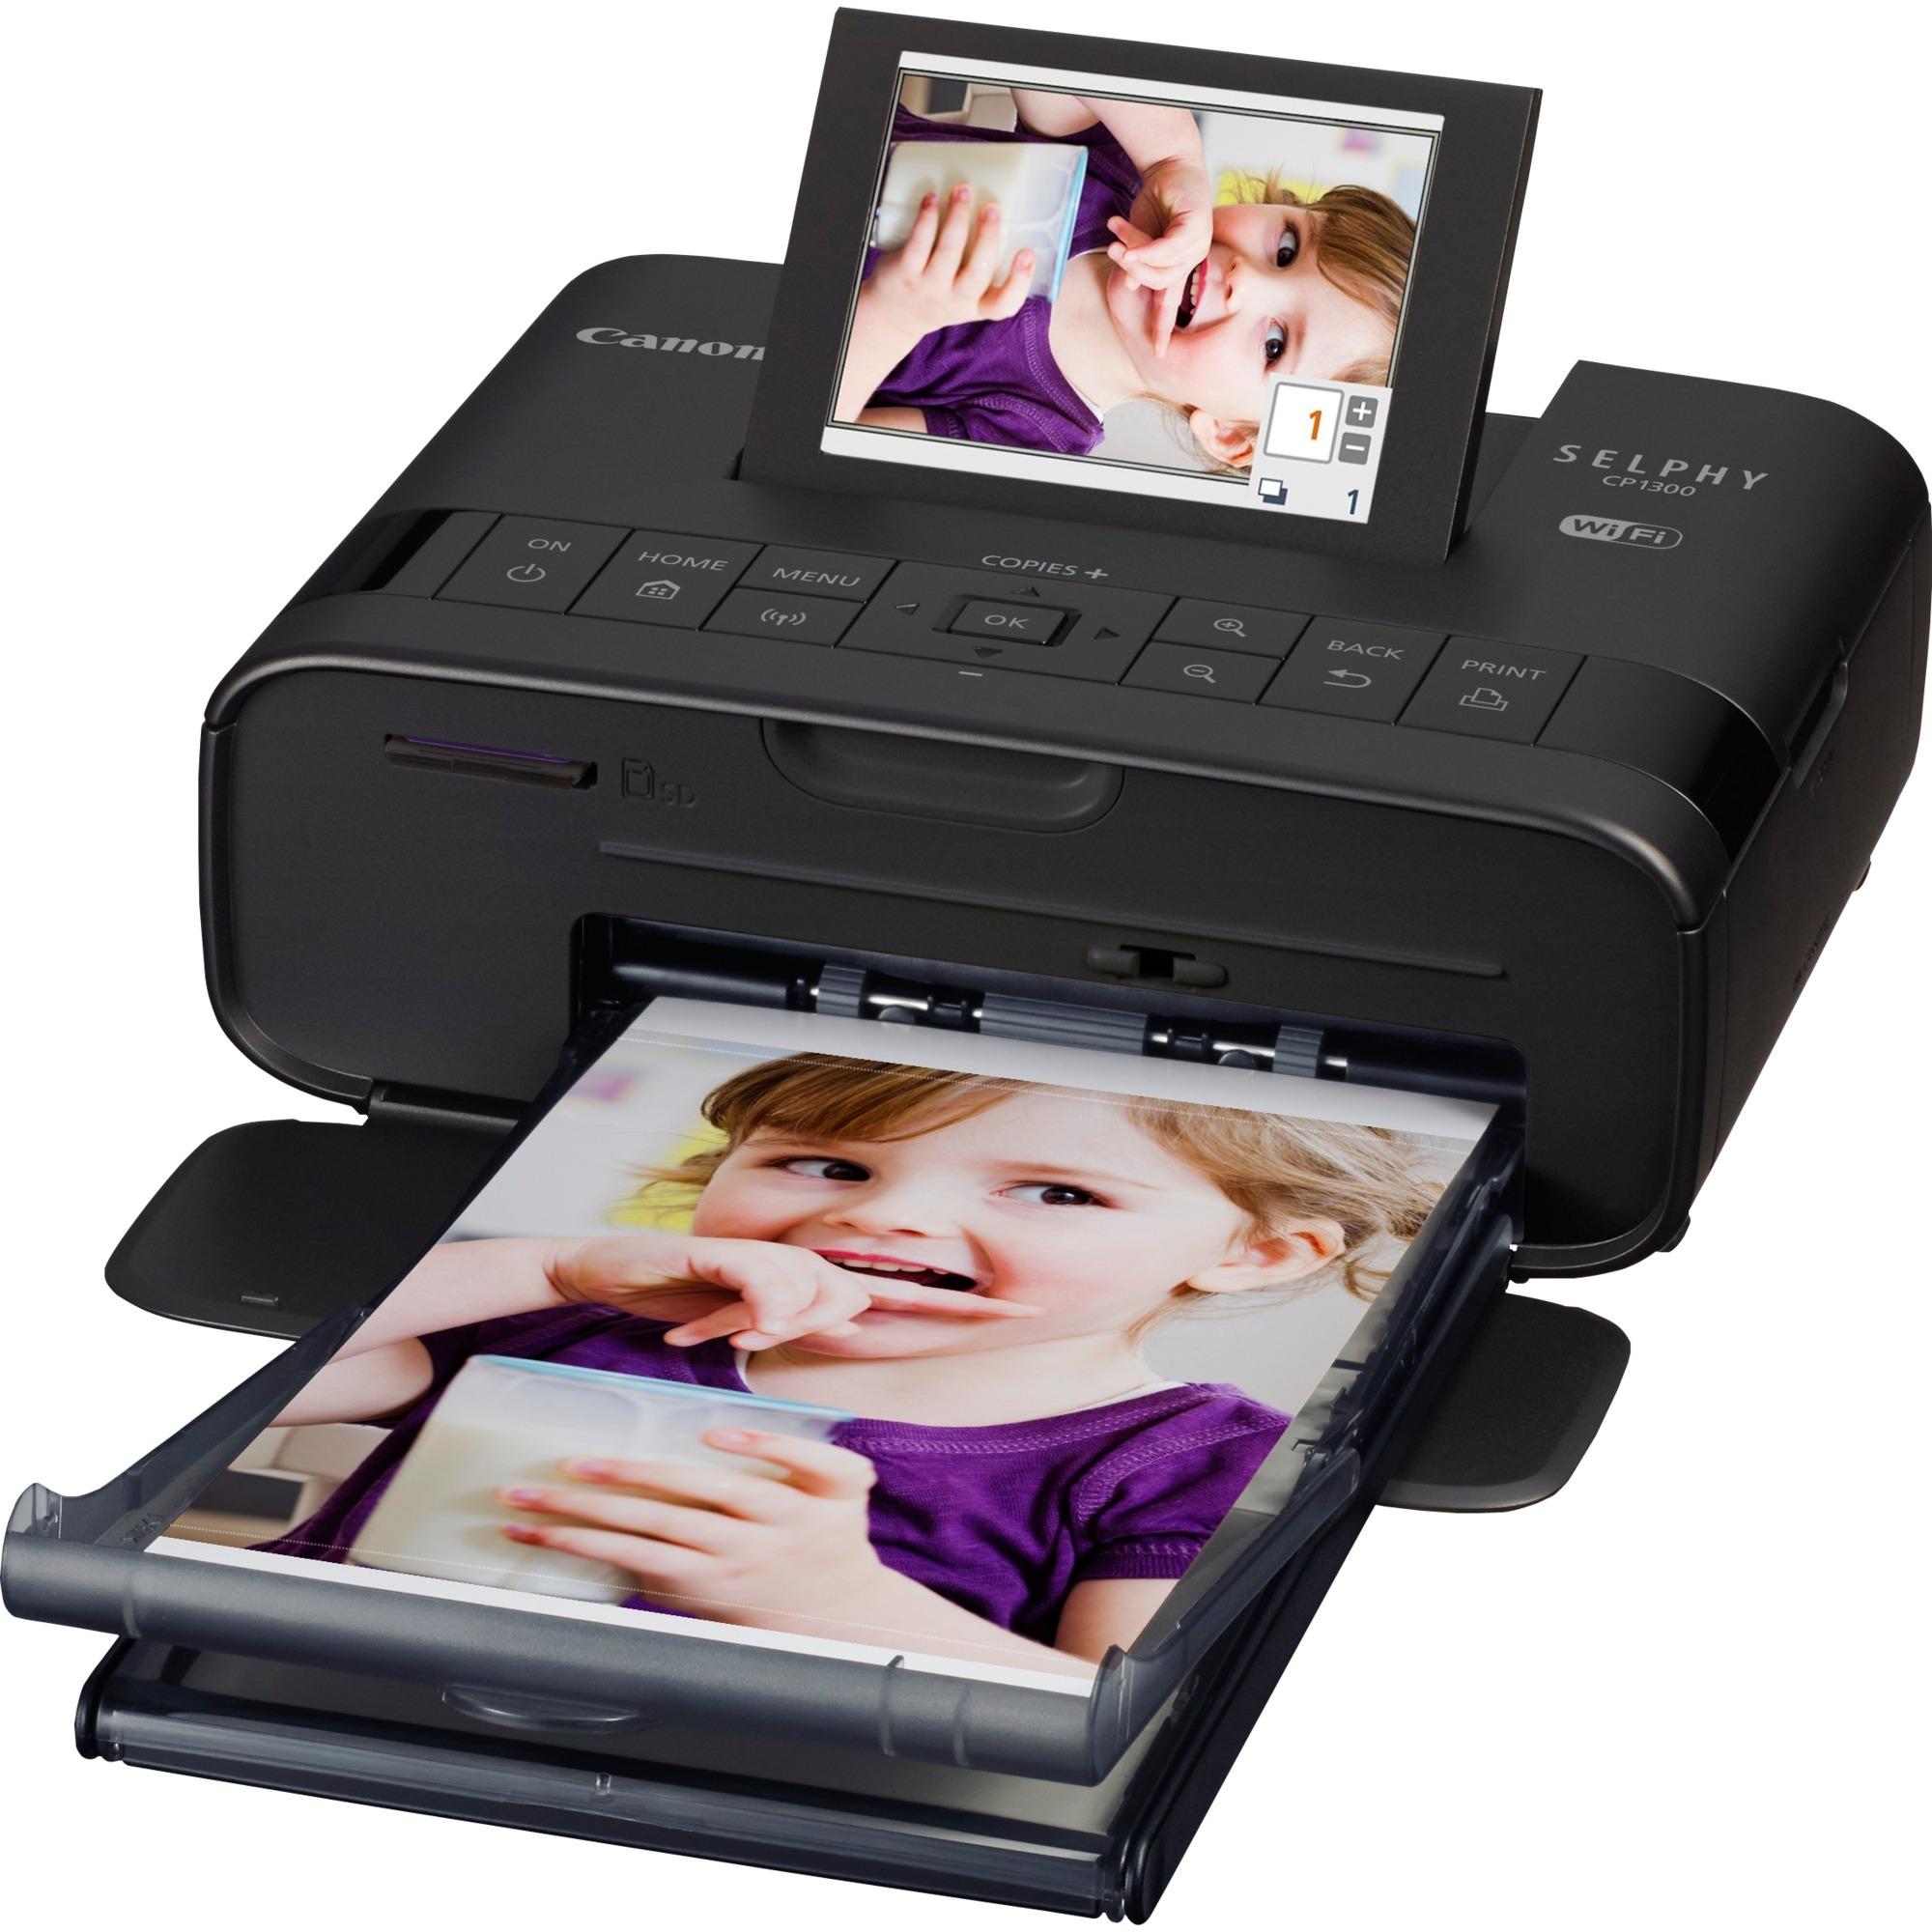 "SELPHY CP1300 impresora de foto Pintar por sublimación 300 x 300 DPI 4"" x 6"" (10x15 cm) Wifi, Impresora de fotos"